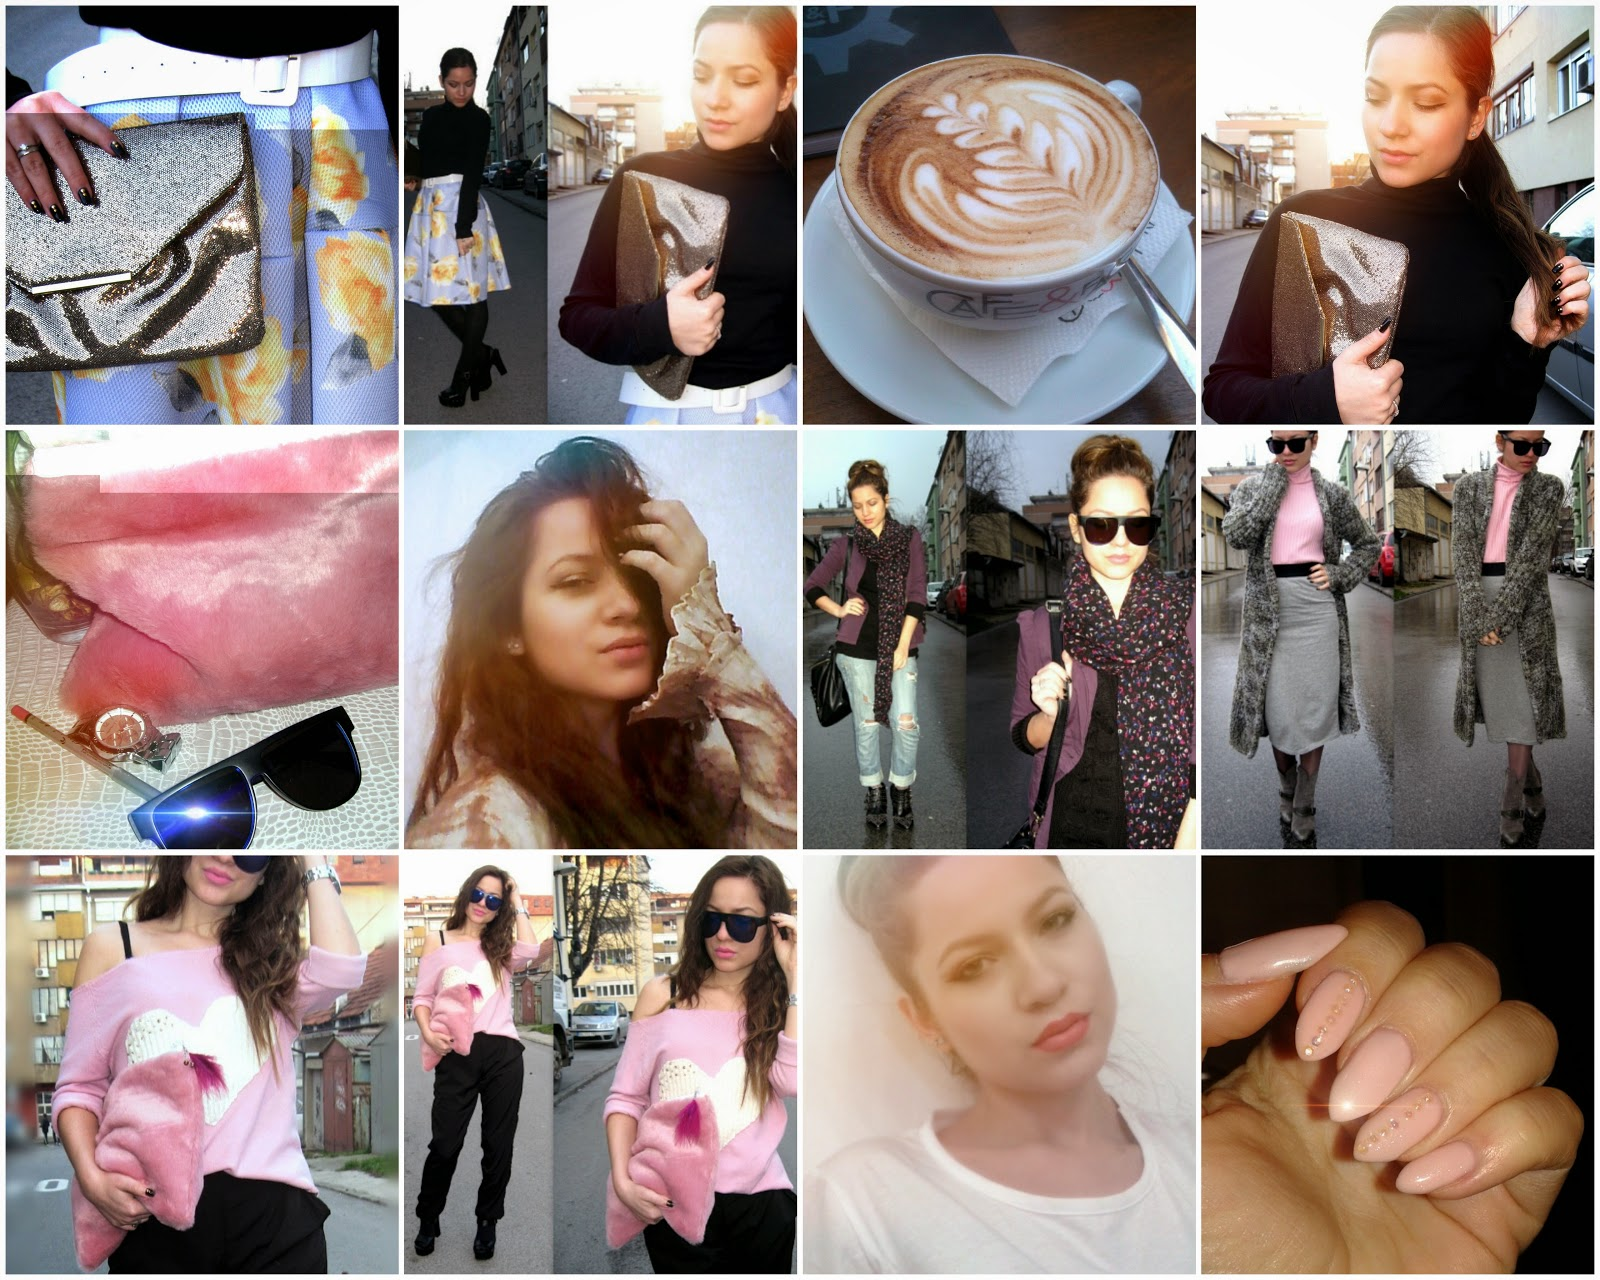 instagram photos, #fashion, #style, #beauty, #fashionblogger, #stylesensemoments